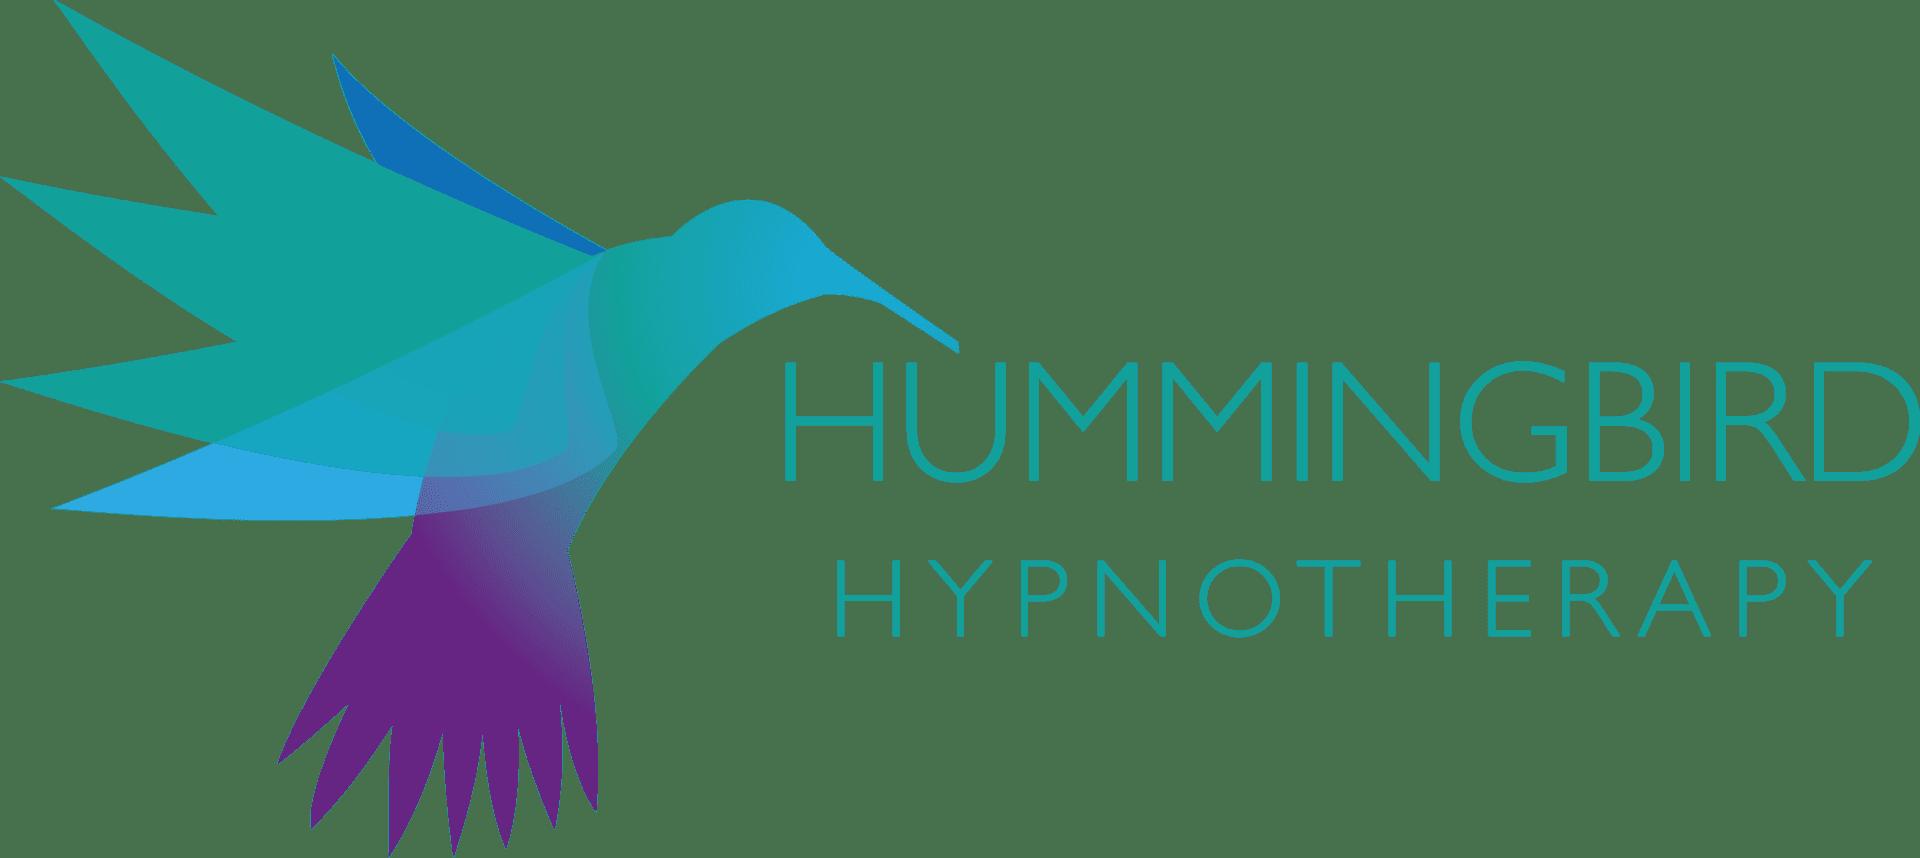 Hummingbird Hypnotherapy Logo • The Wedding Guide UK